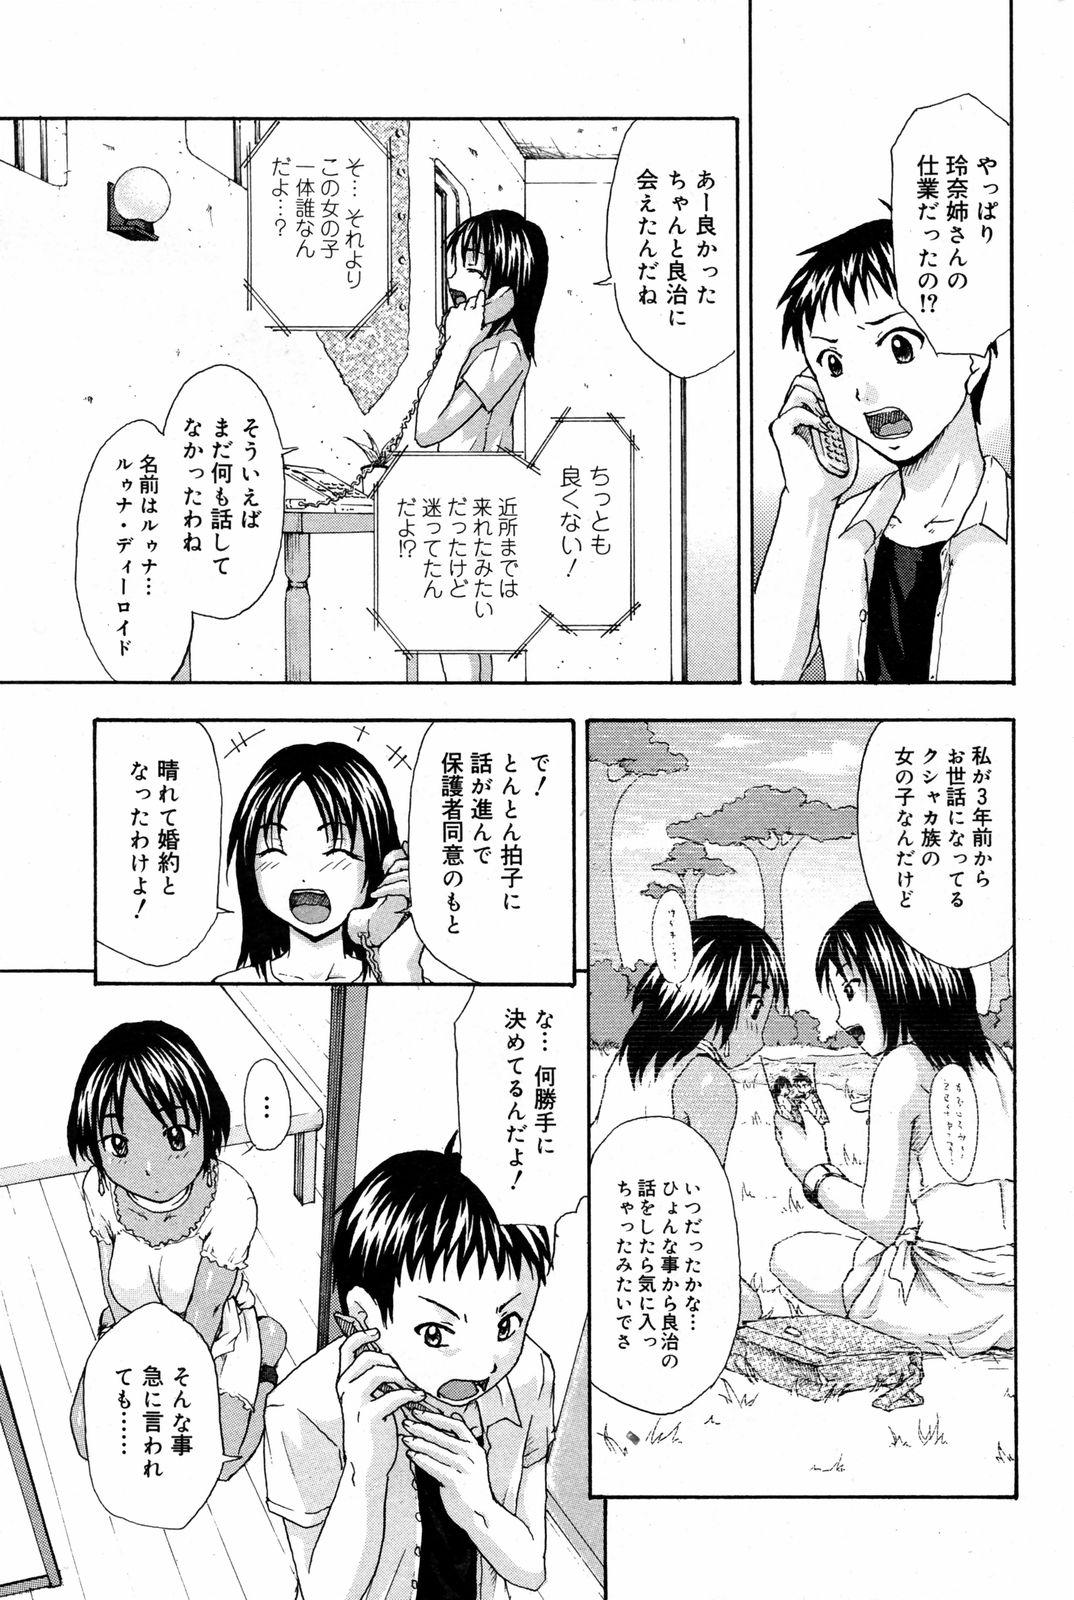 Manga Bangaichi 2008-03 214